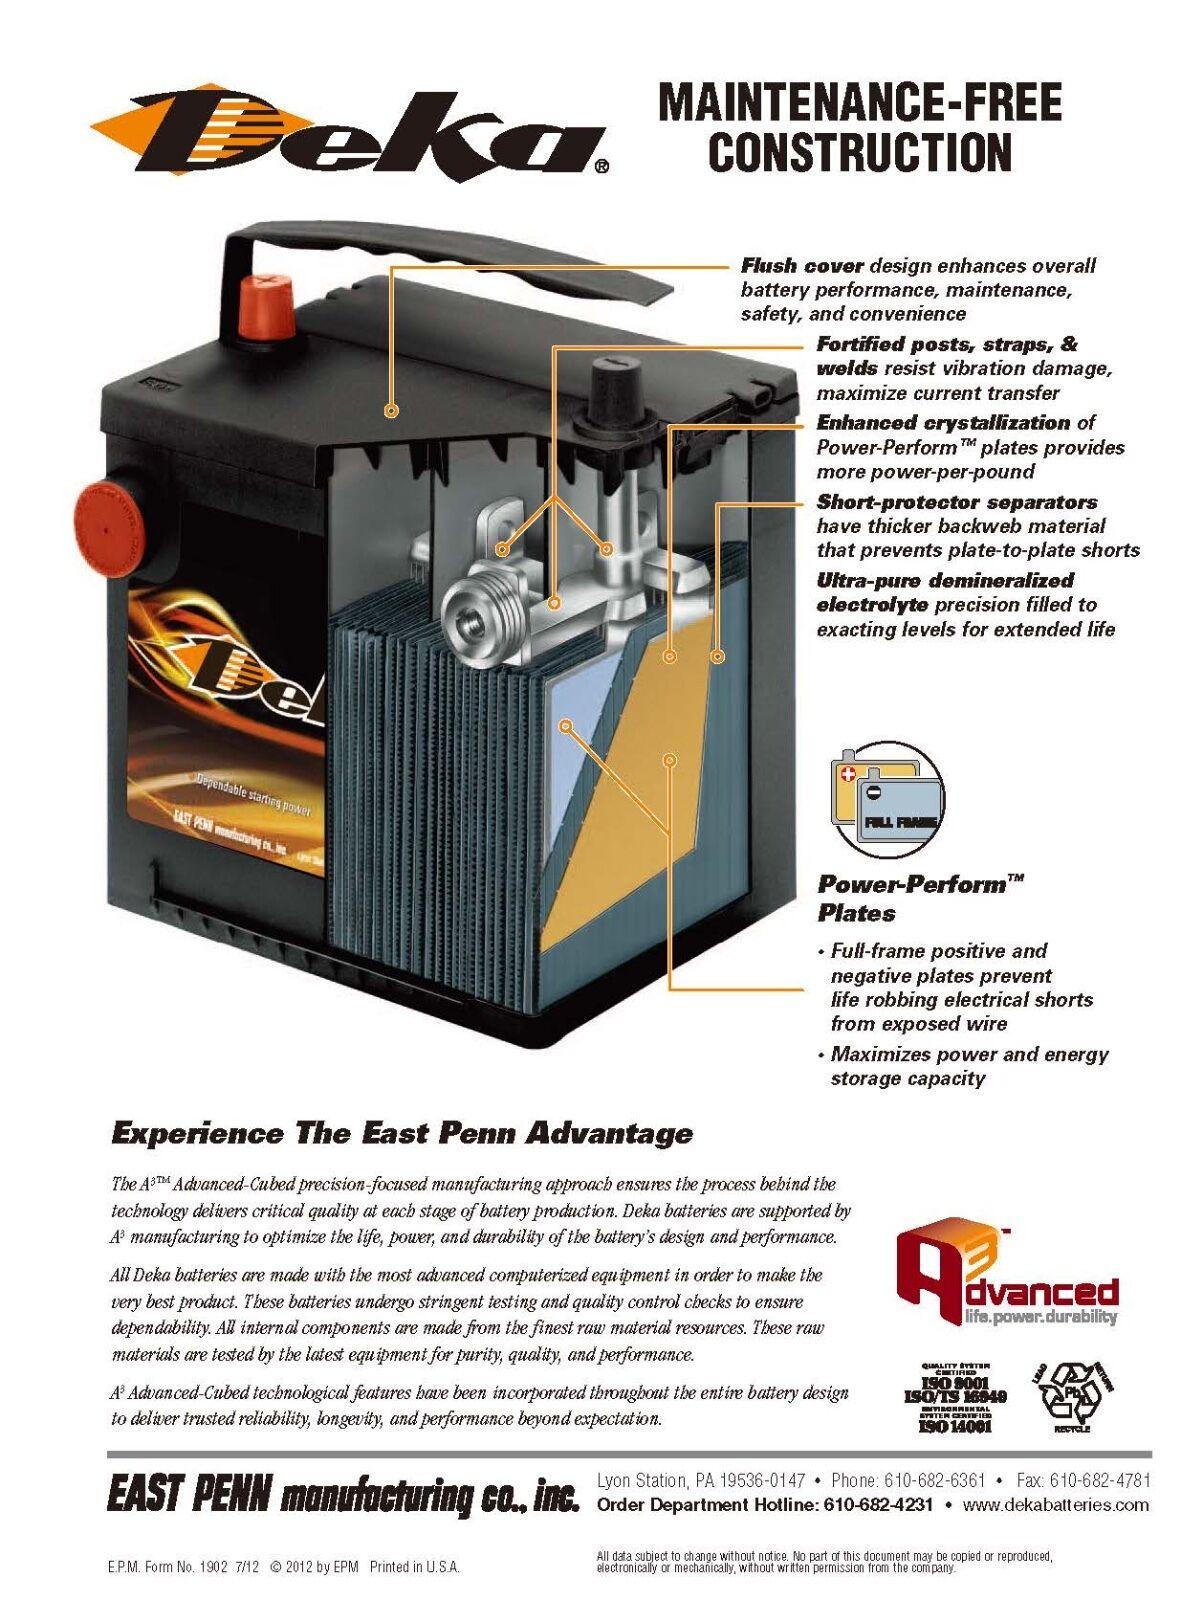 DEKA GENUINE NEW 651RMF 12-VOLT Gold Battery 615Amp Cranking